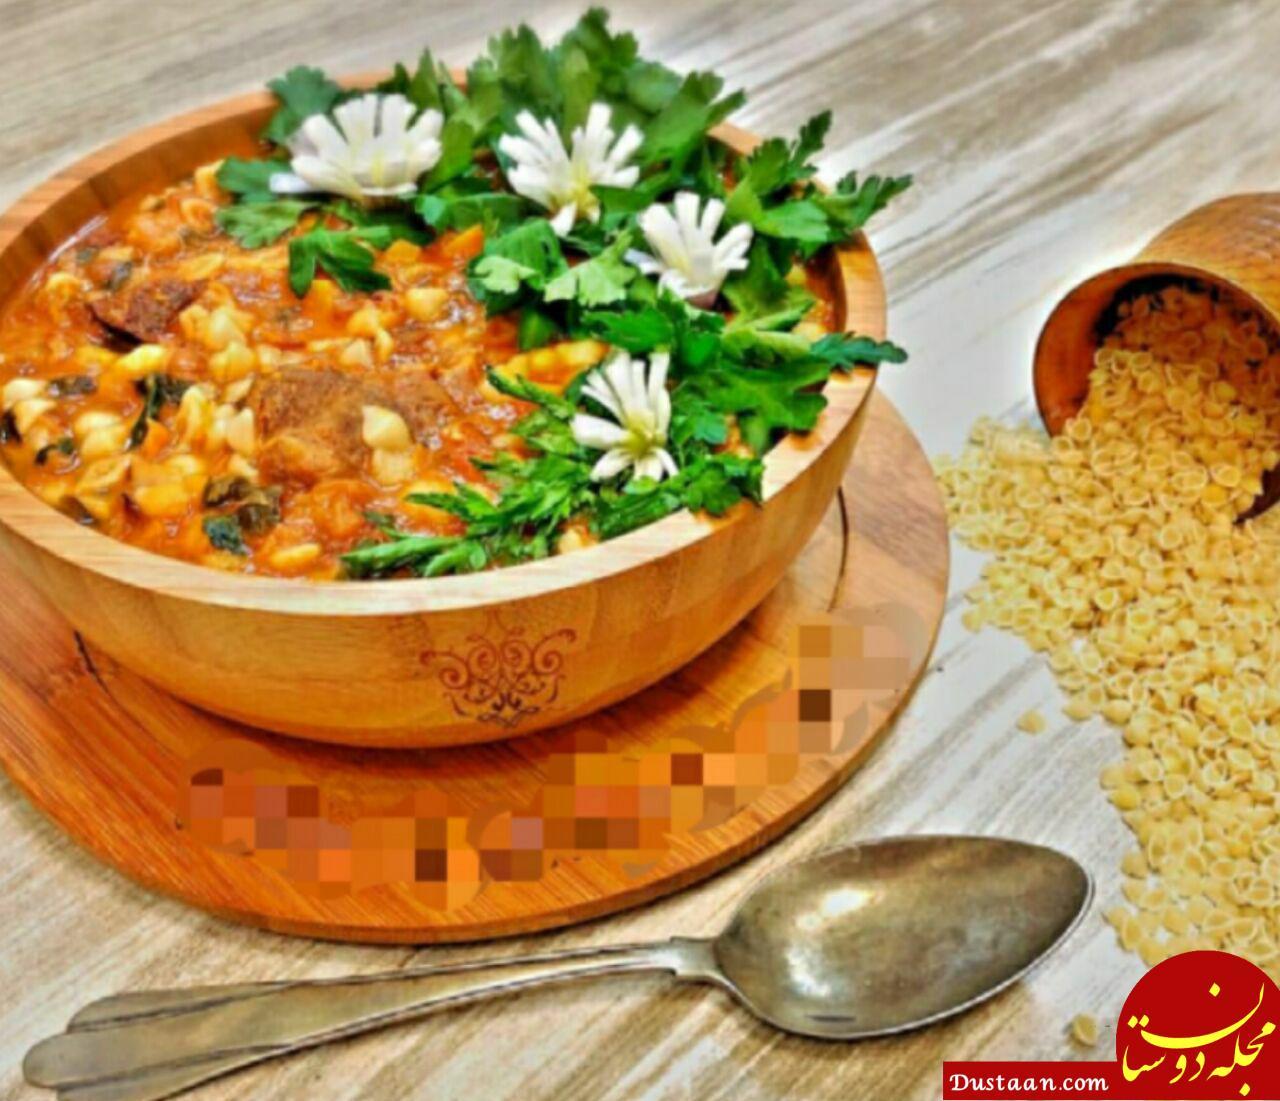 www.dustaan.com طرز تهیه سوپ ماهیچه پیازچه به سبکی خوشمزه